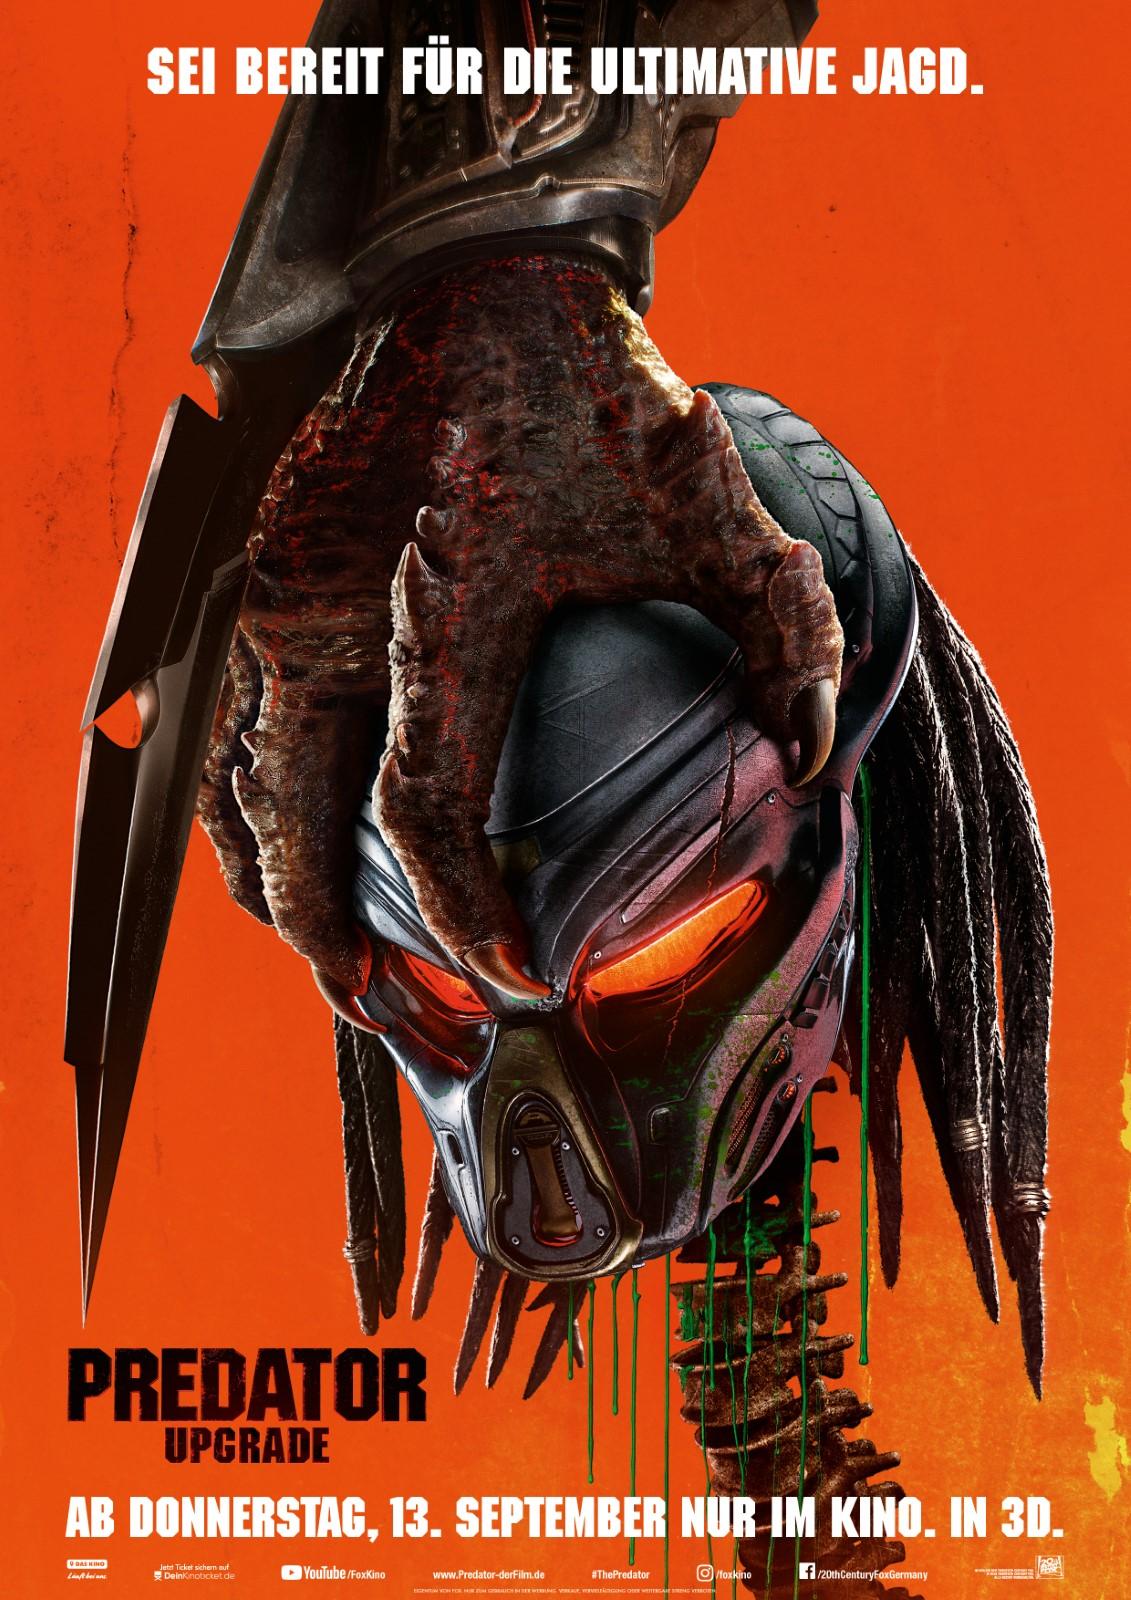 Predator 2019 Besetzung